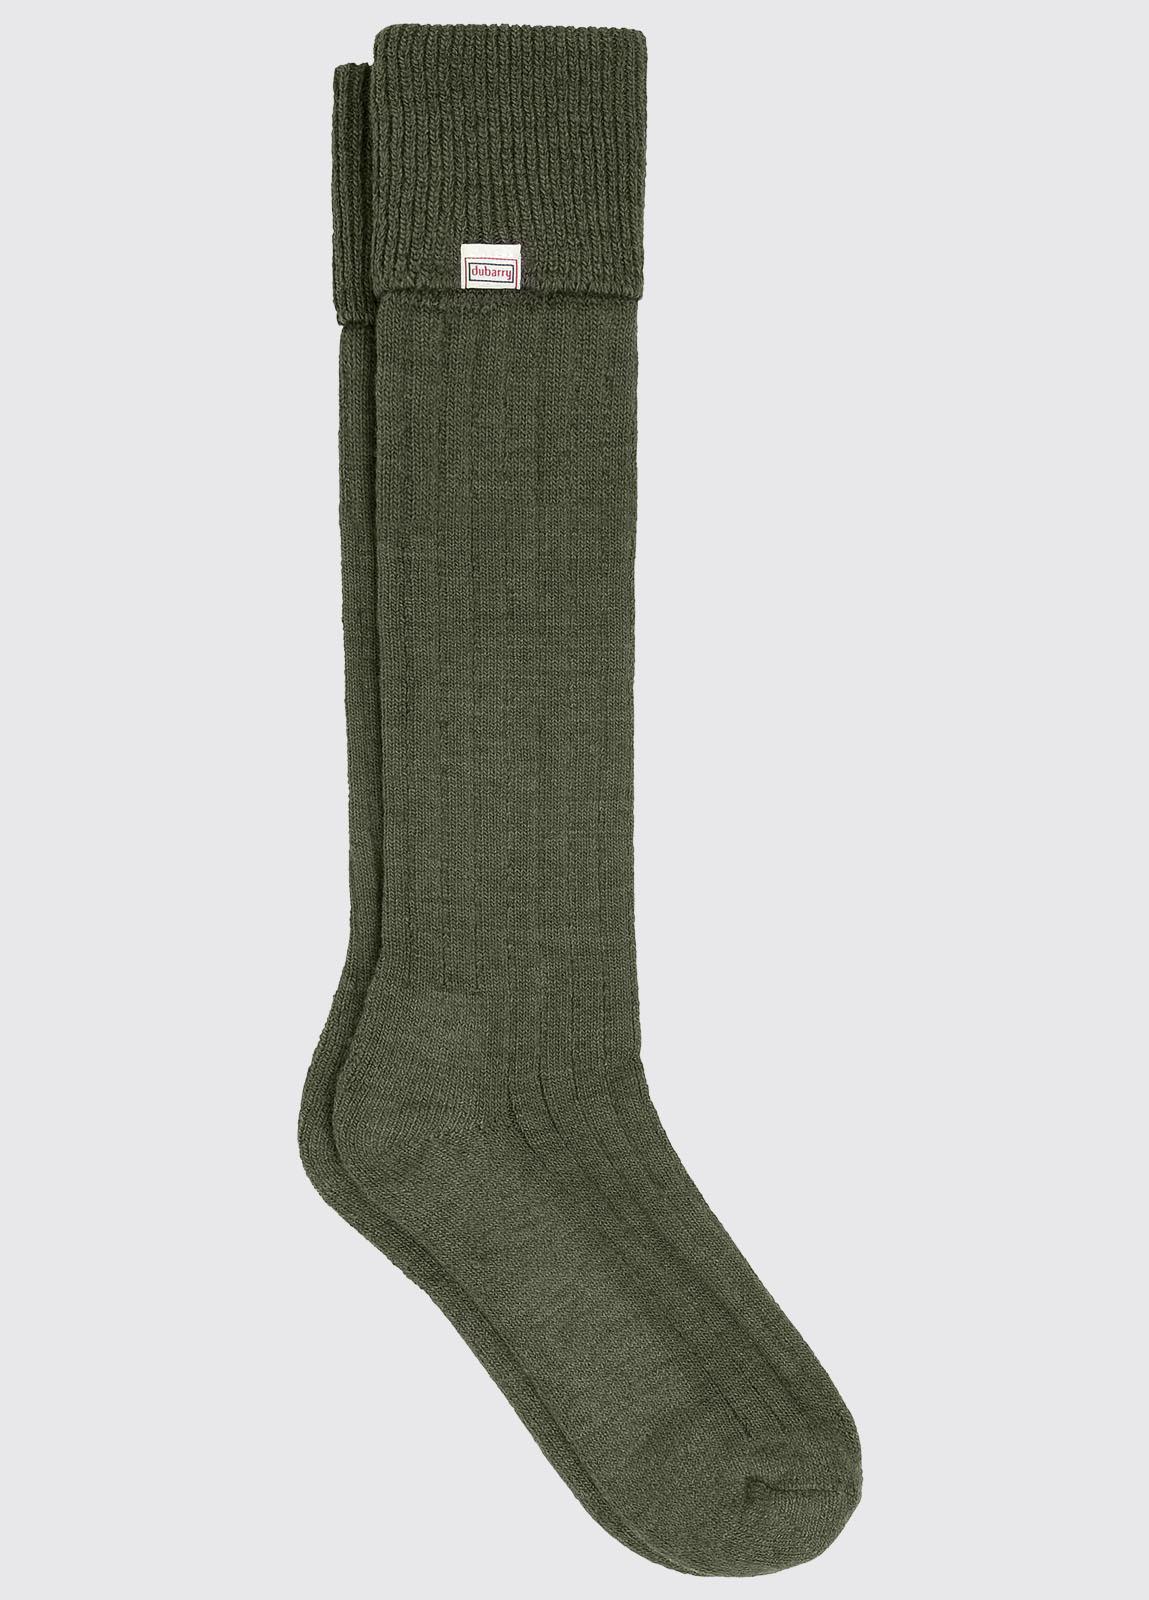 Alpaca Socks - Olive